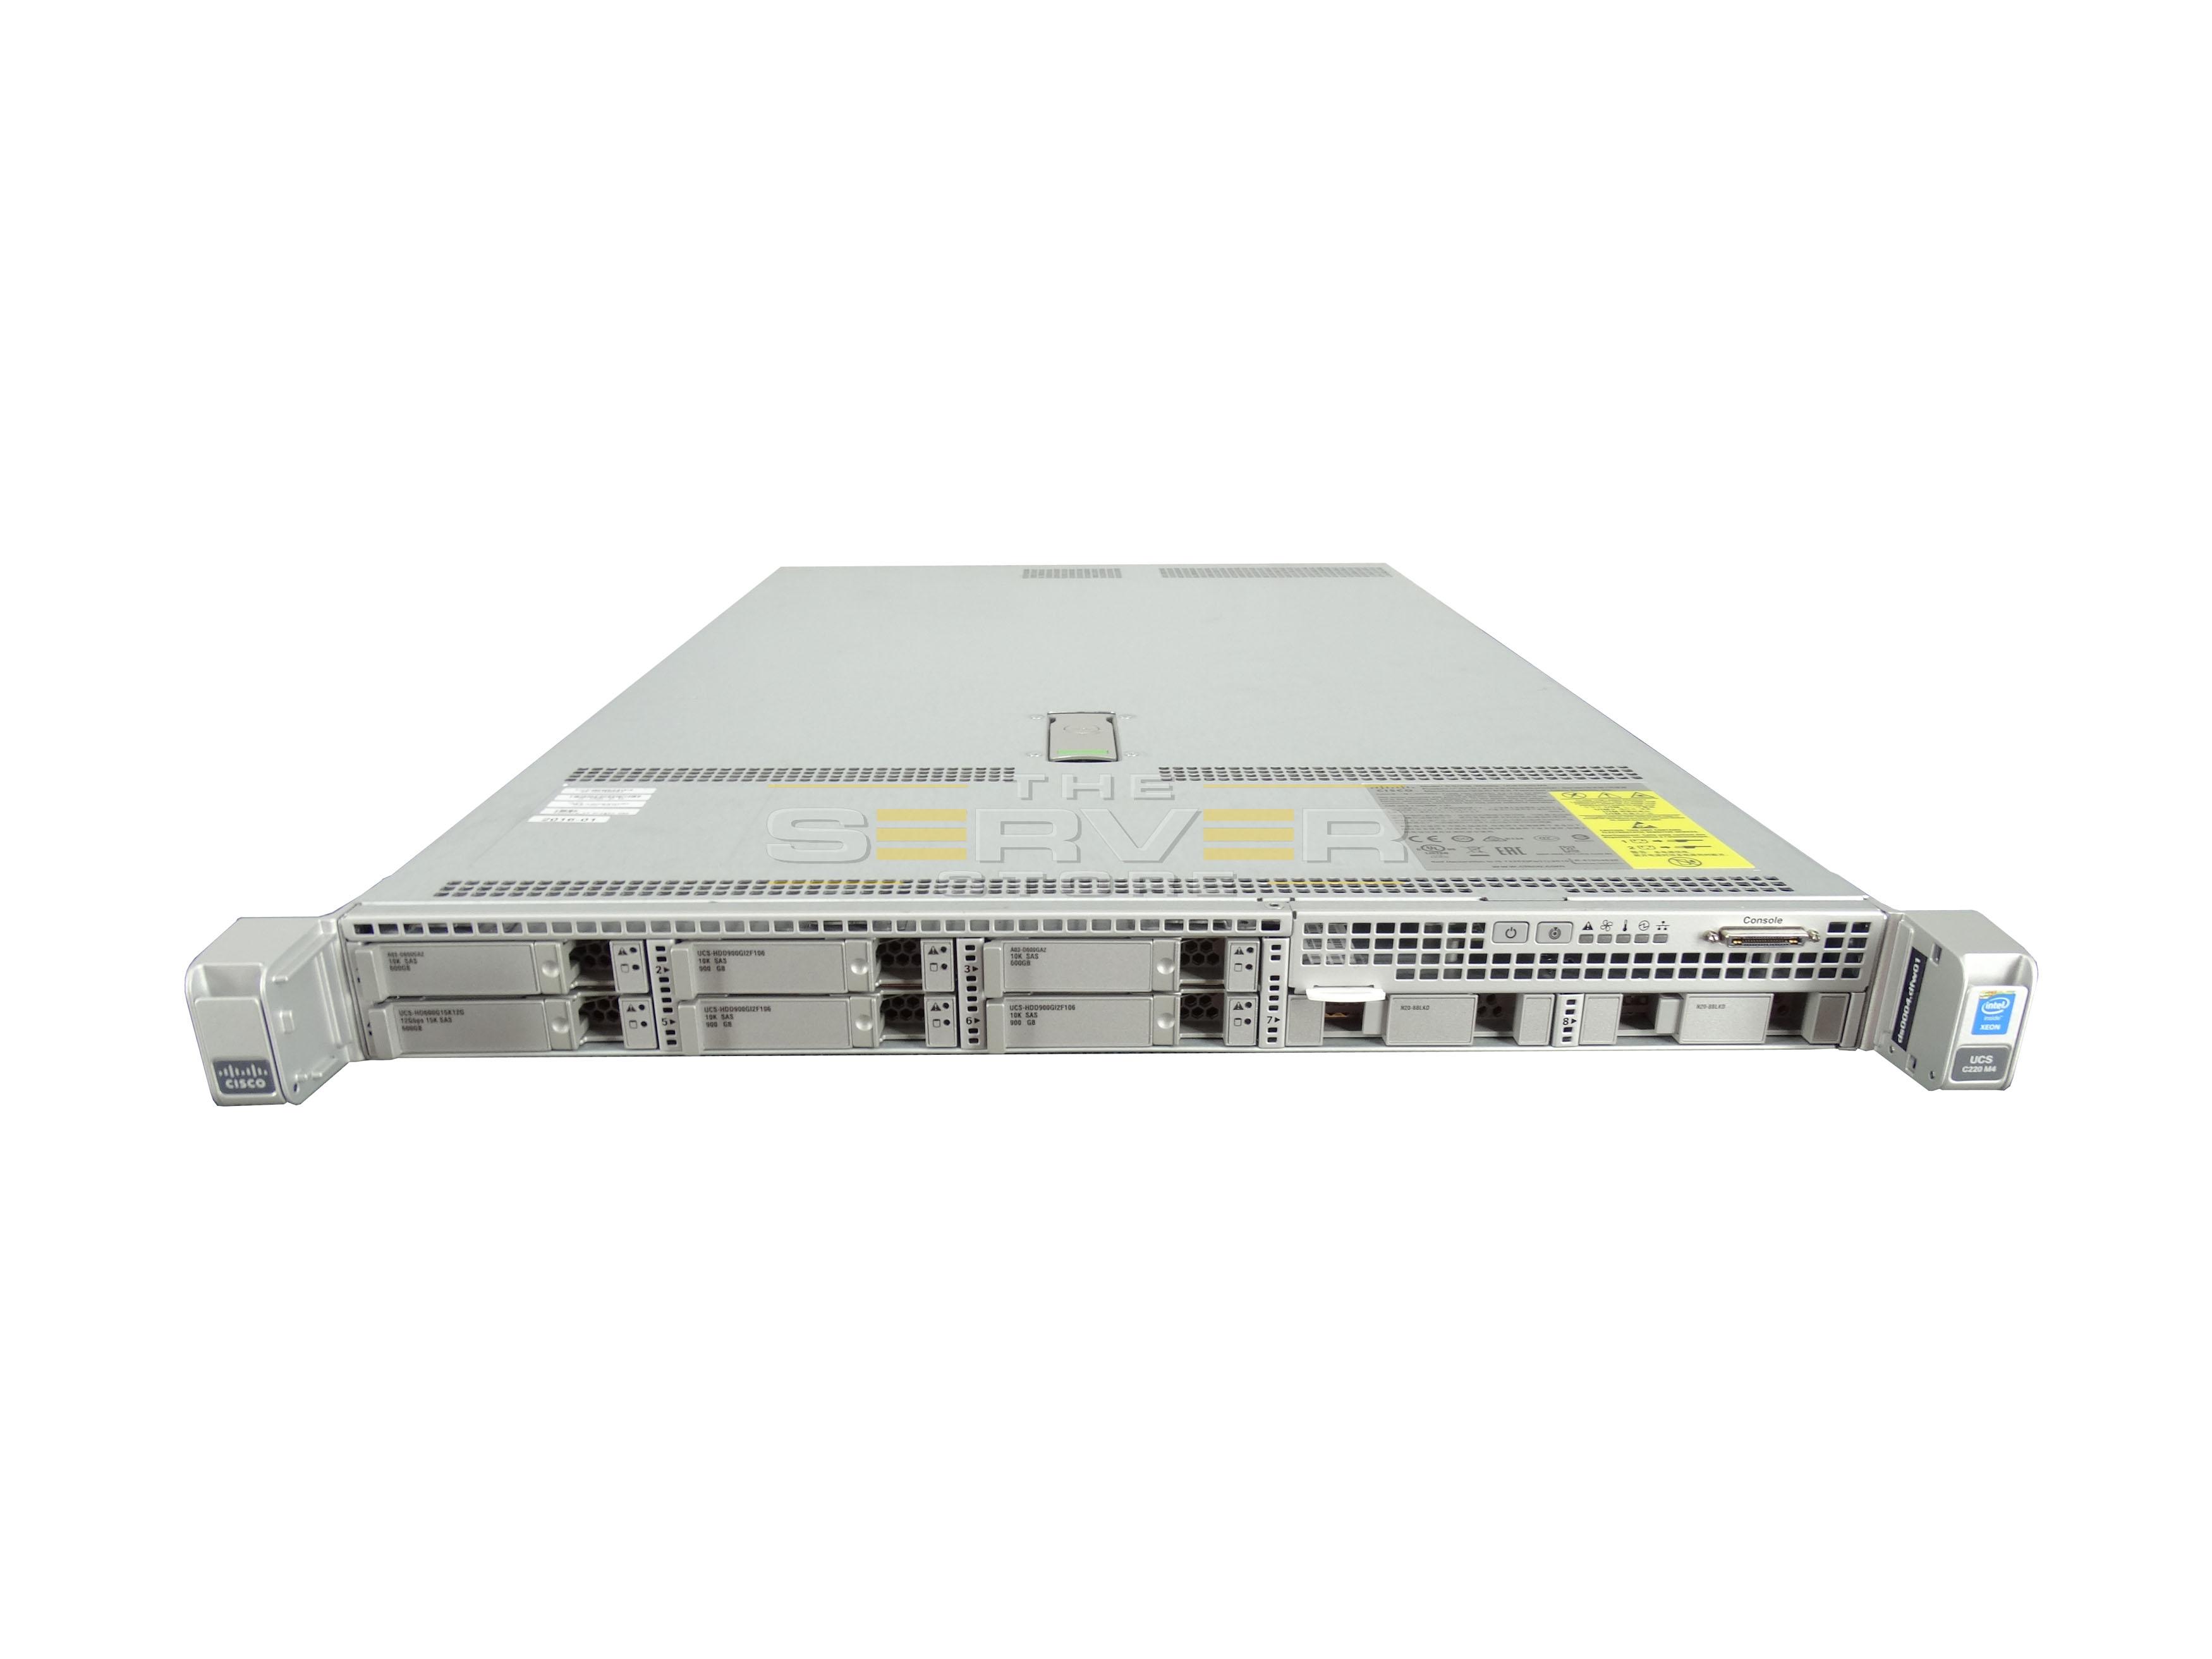 Cisco Ucs C220 M4 8x Sff 2u Rack Mount Server